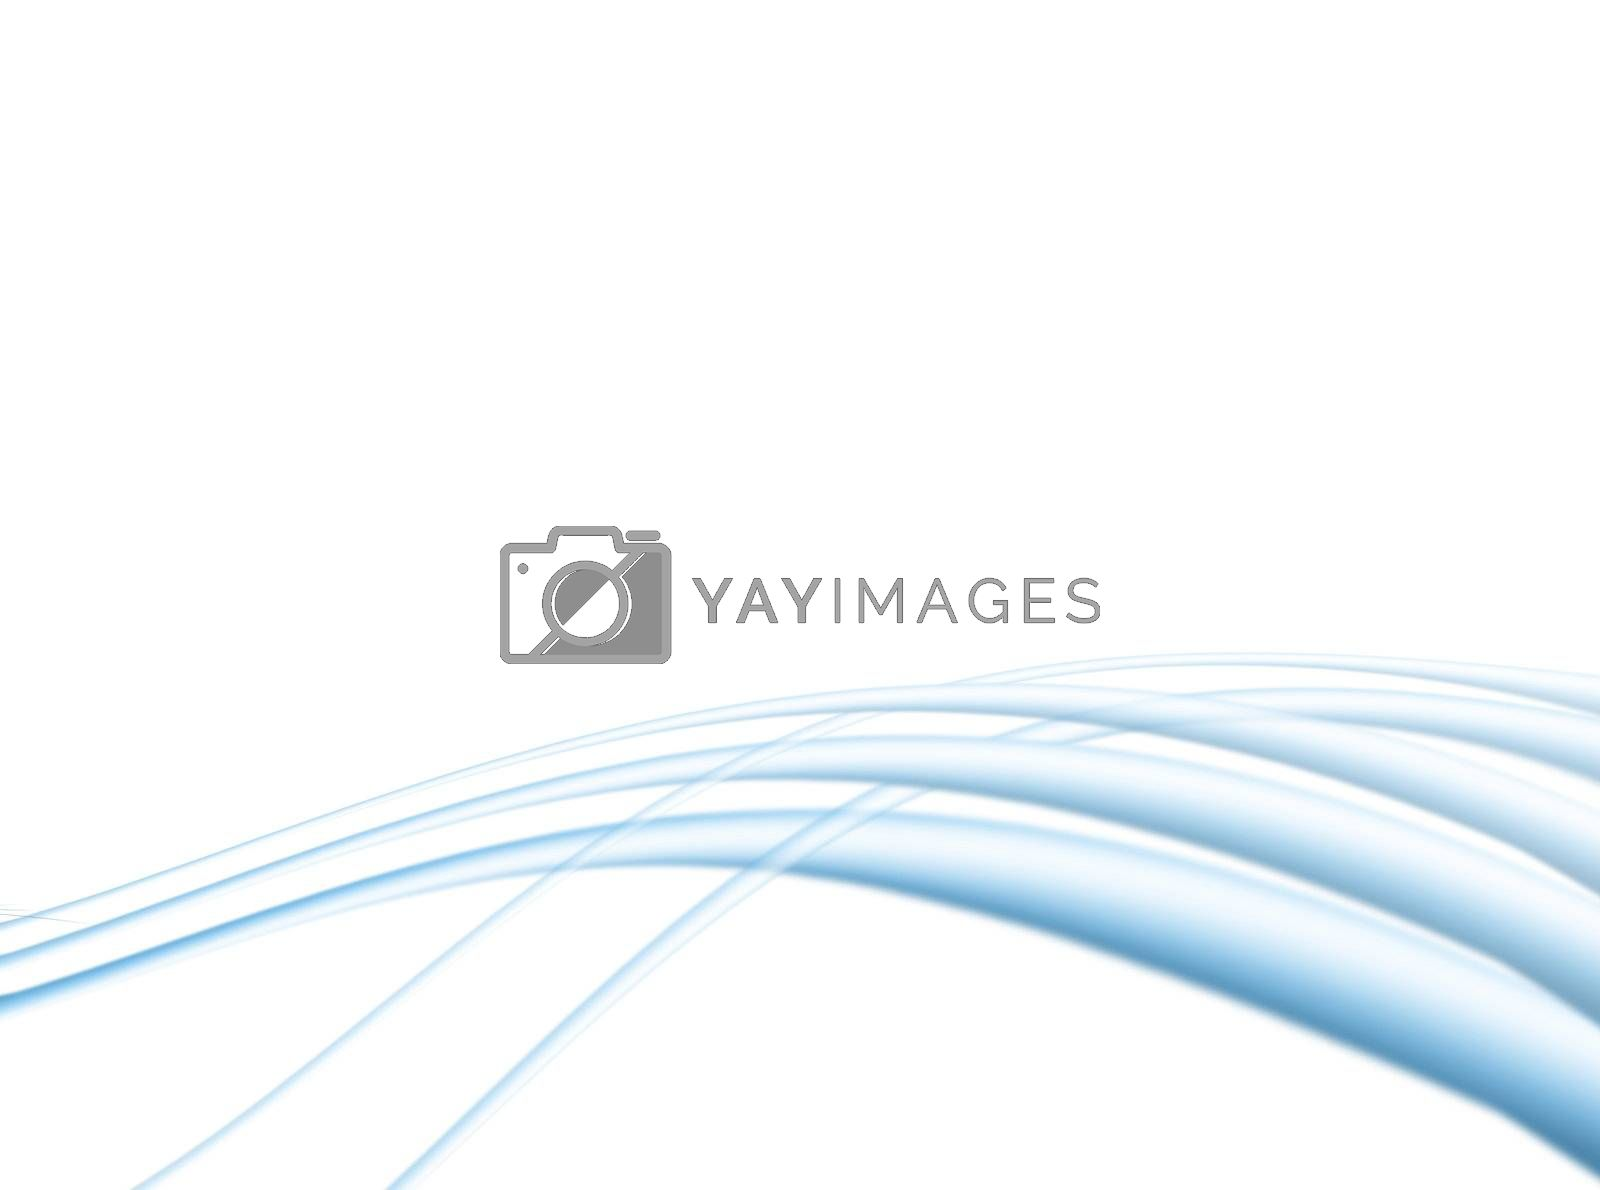 soft dynamic waves on white background. illustration